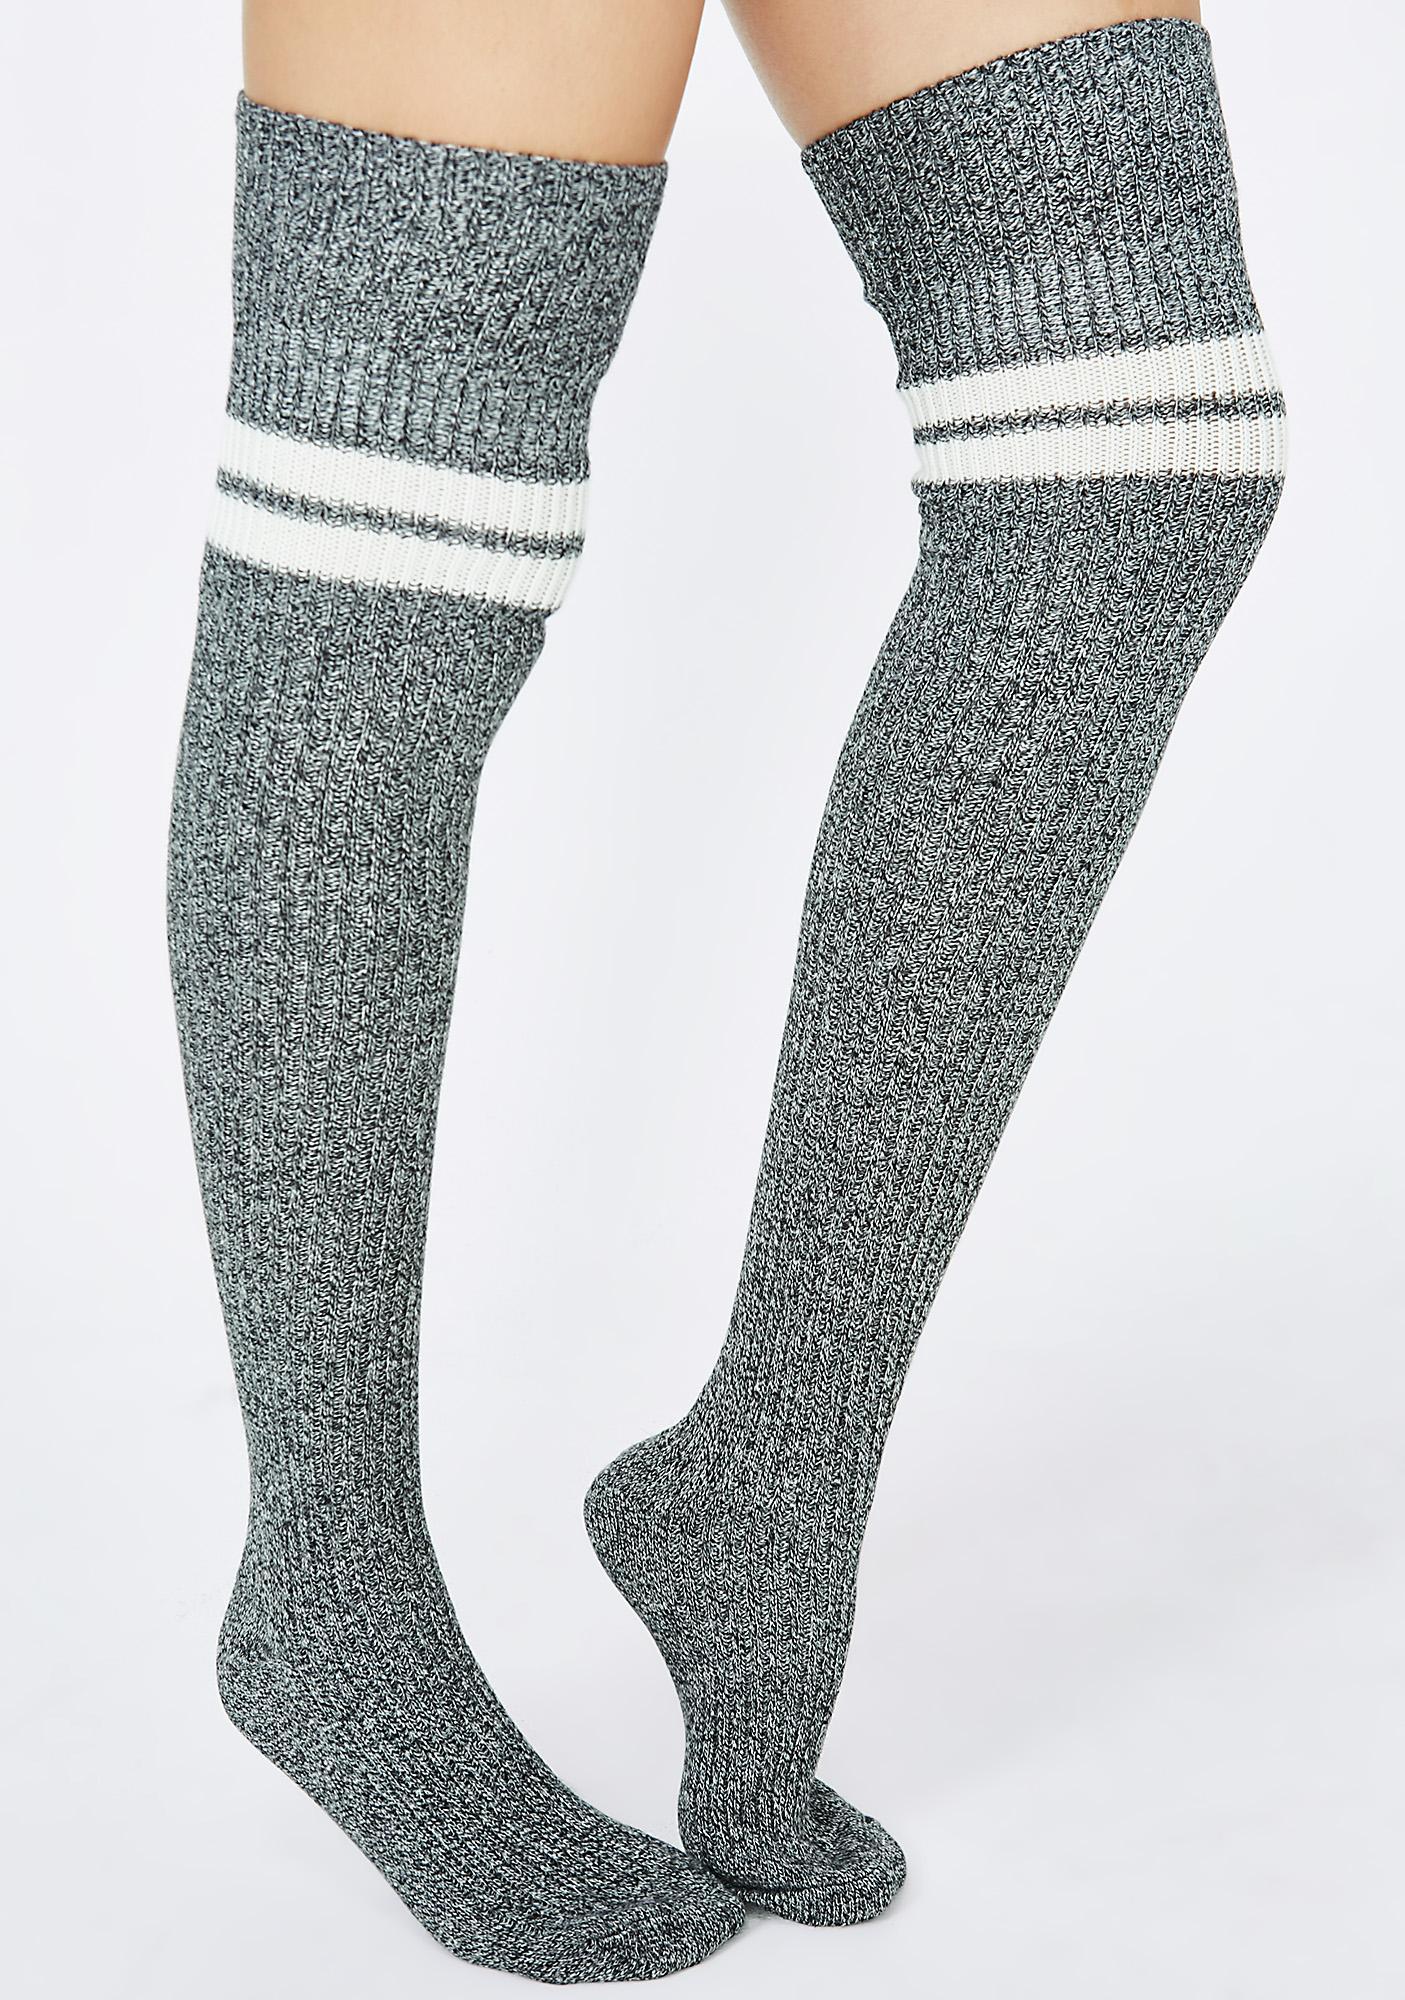 No Contest Thigh High Socks